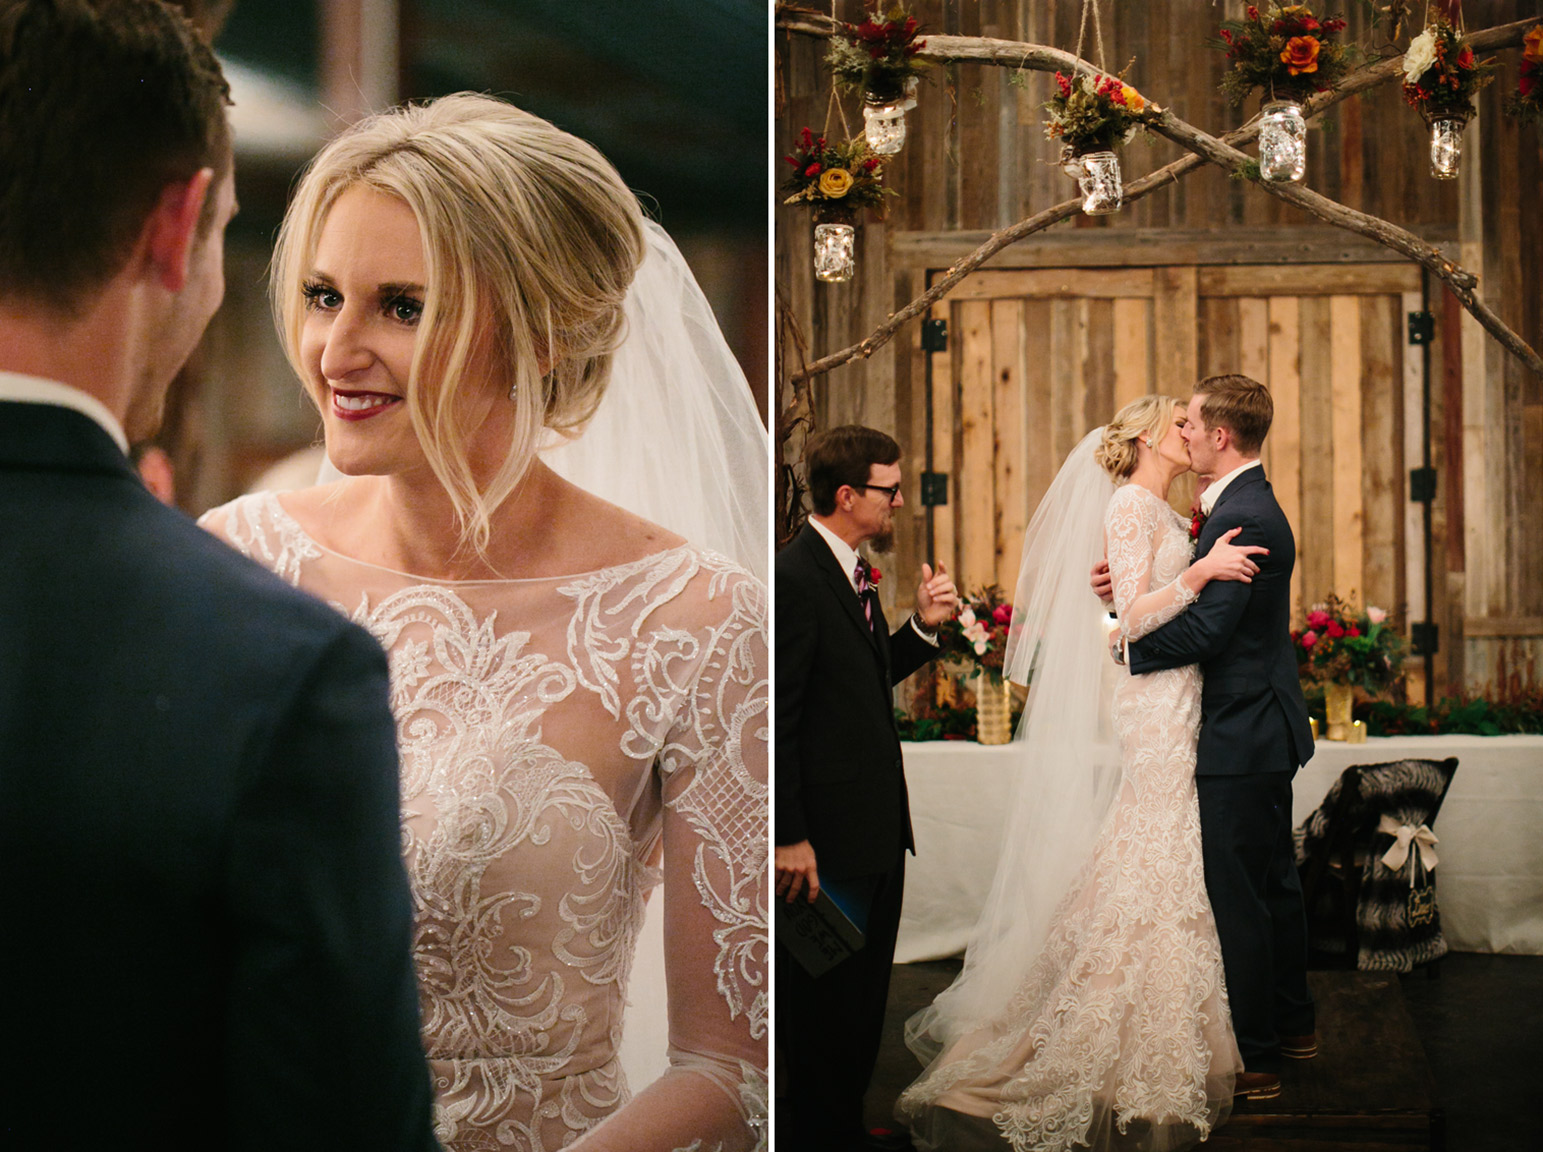 Cotton_Creek_Barn_Winter_Wedding_WeddingPhotographer047.jpg